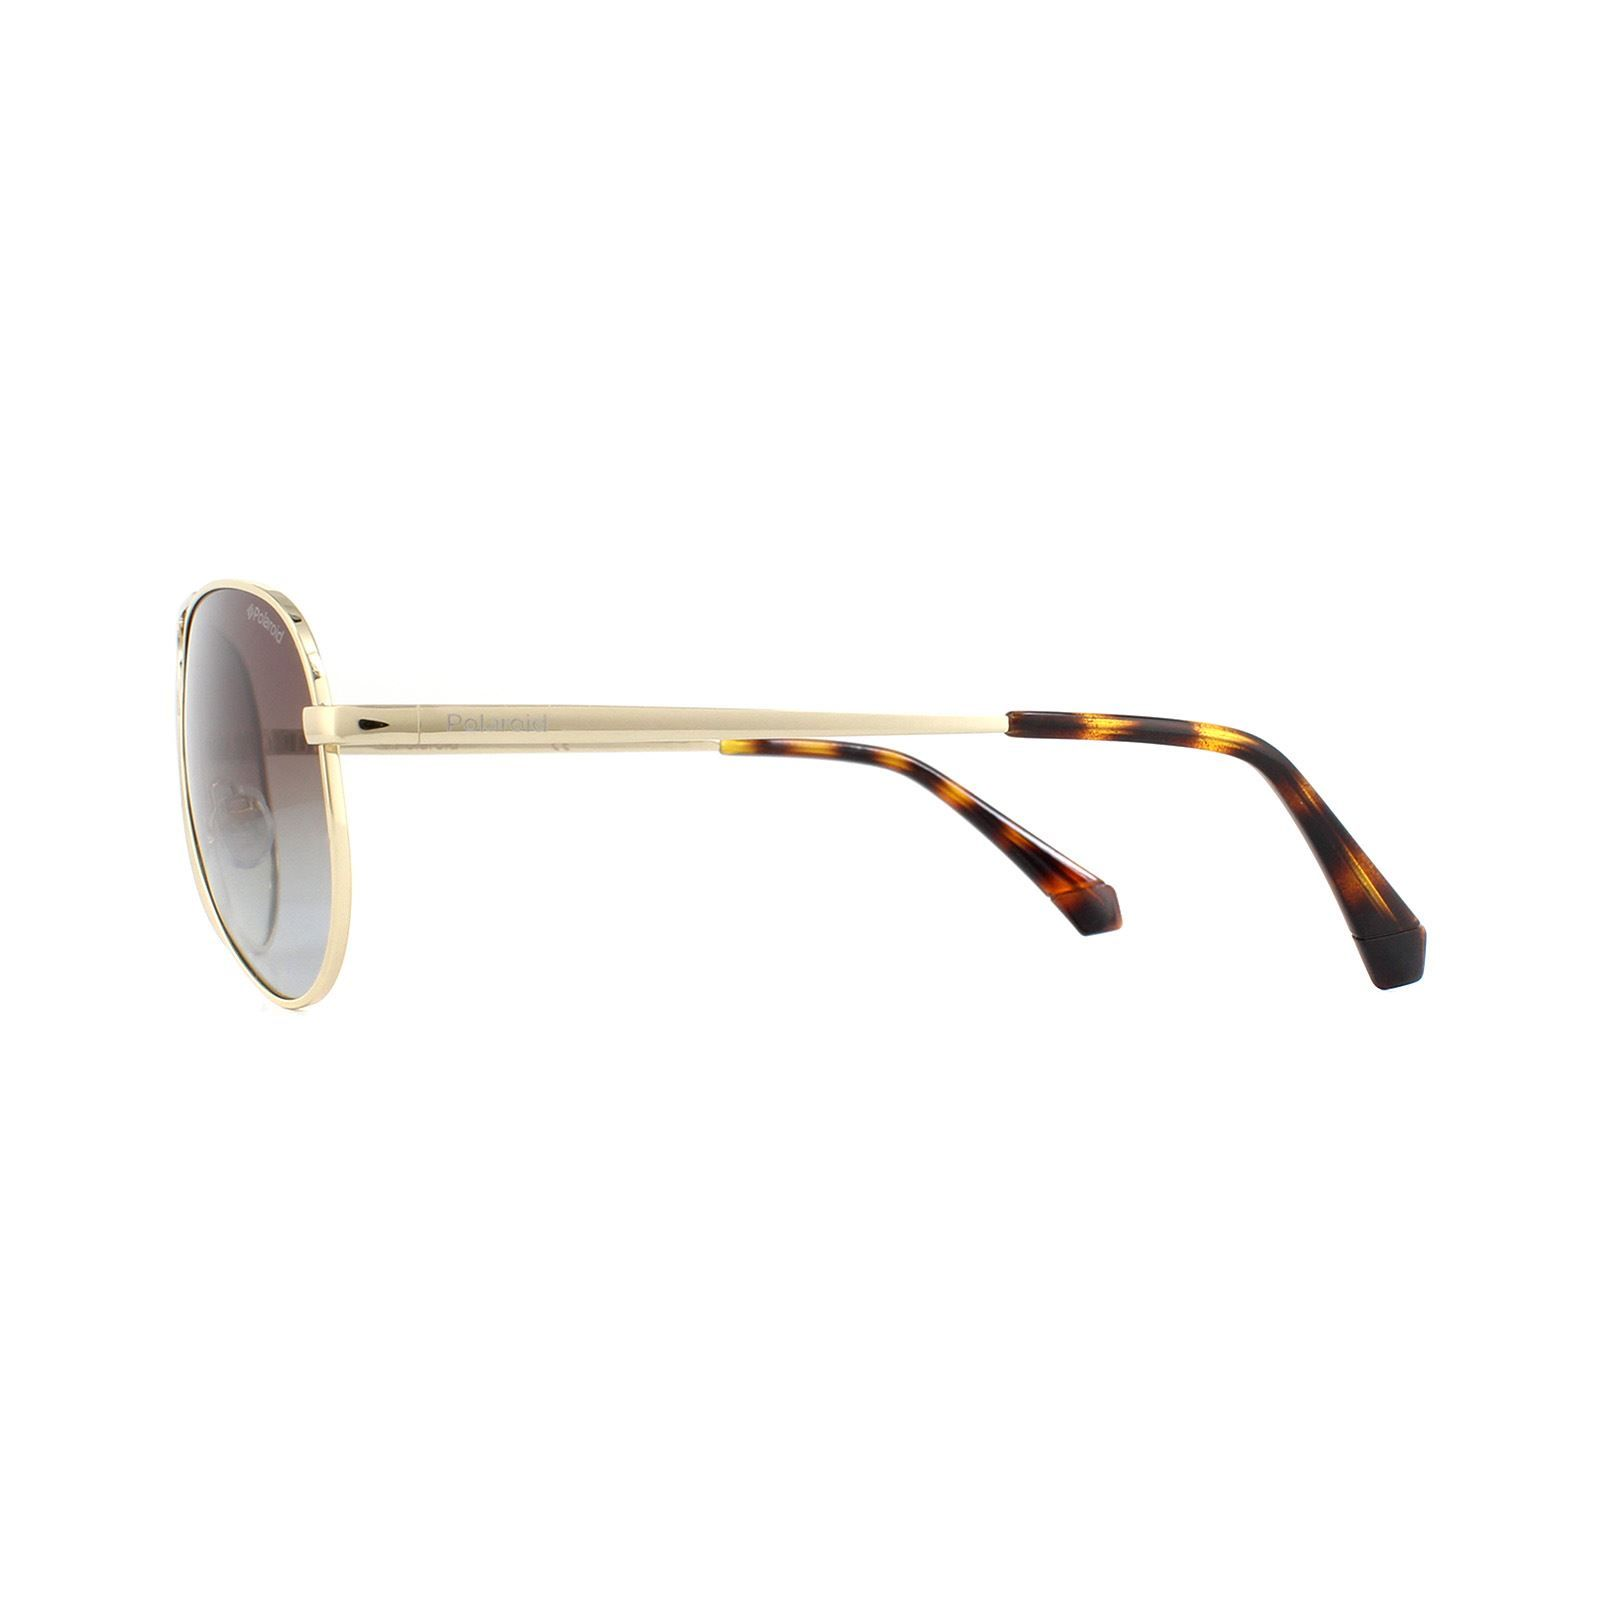 Polaroid Sunglasses 6012/N/NEW J5G Aviator LA Gold Brown Gradient Polarized 56mm